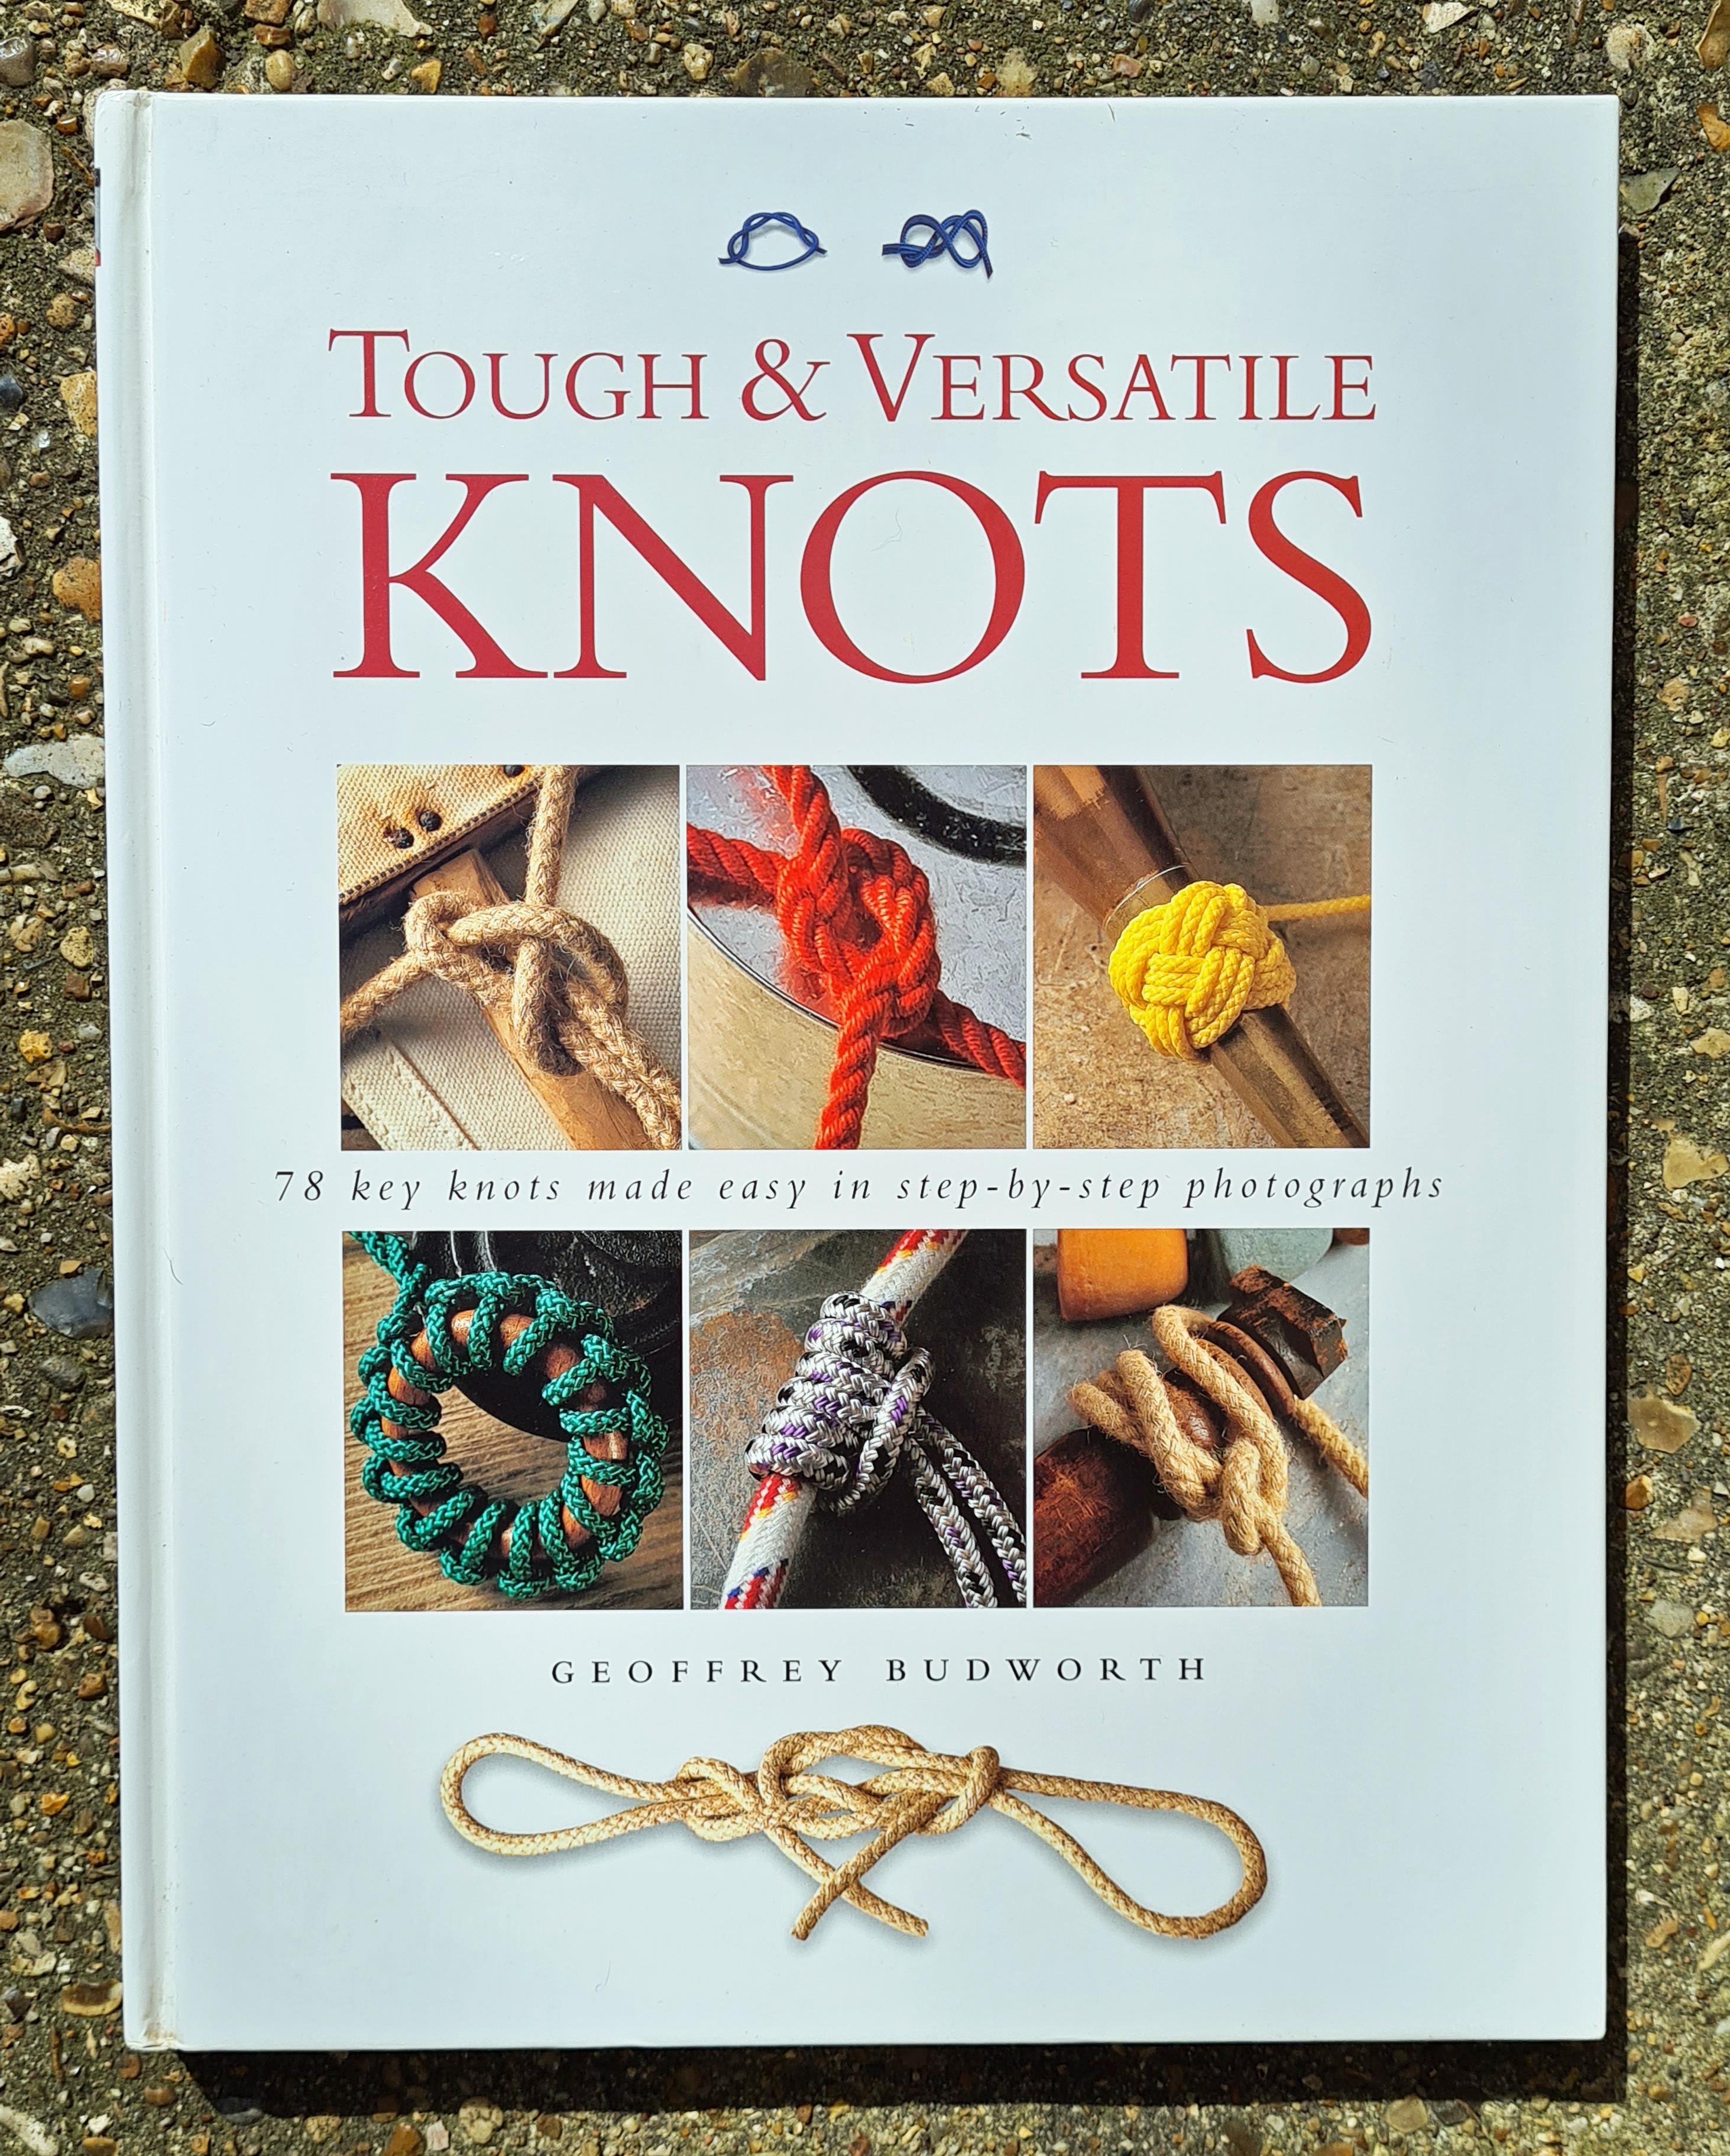 Tough & Versatile Knots by Geoffrey Budworth